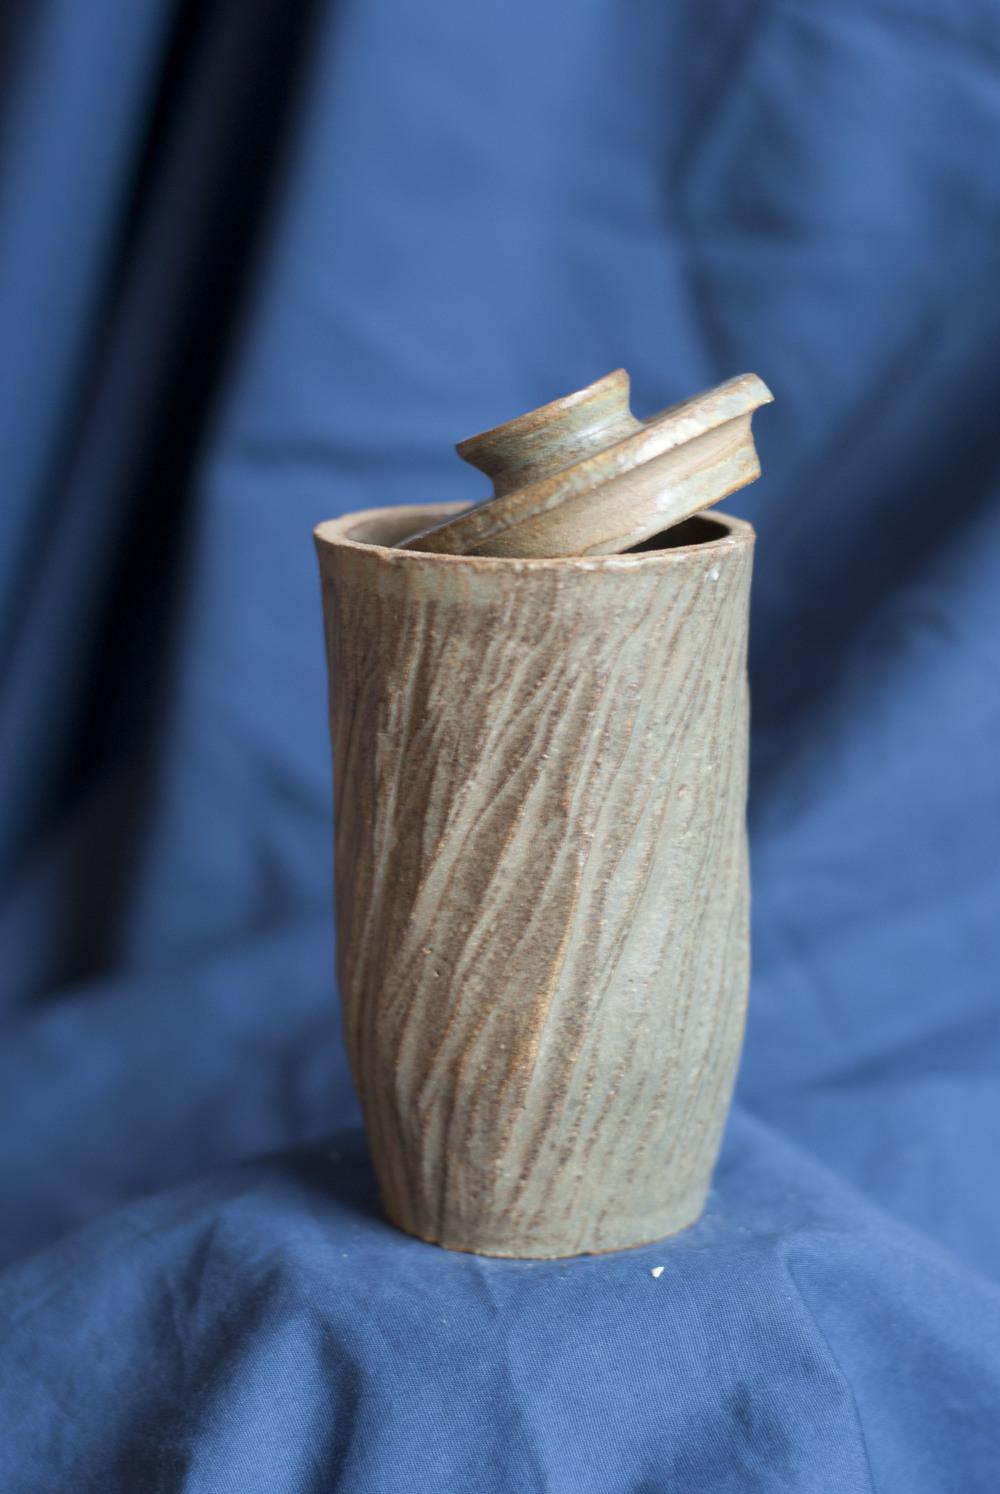 4.5x2.5, 2014, Stoneware